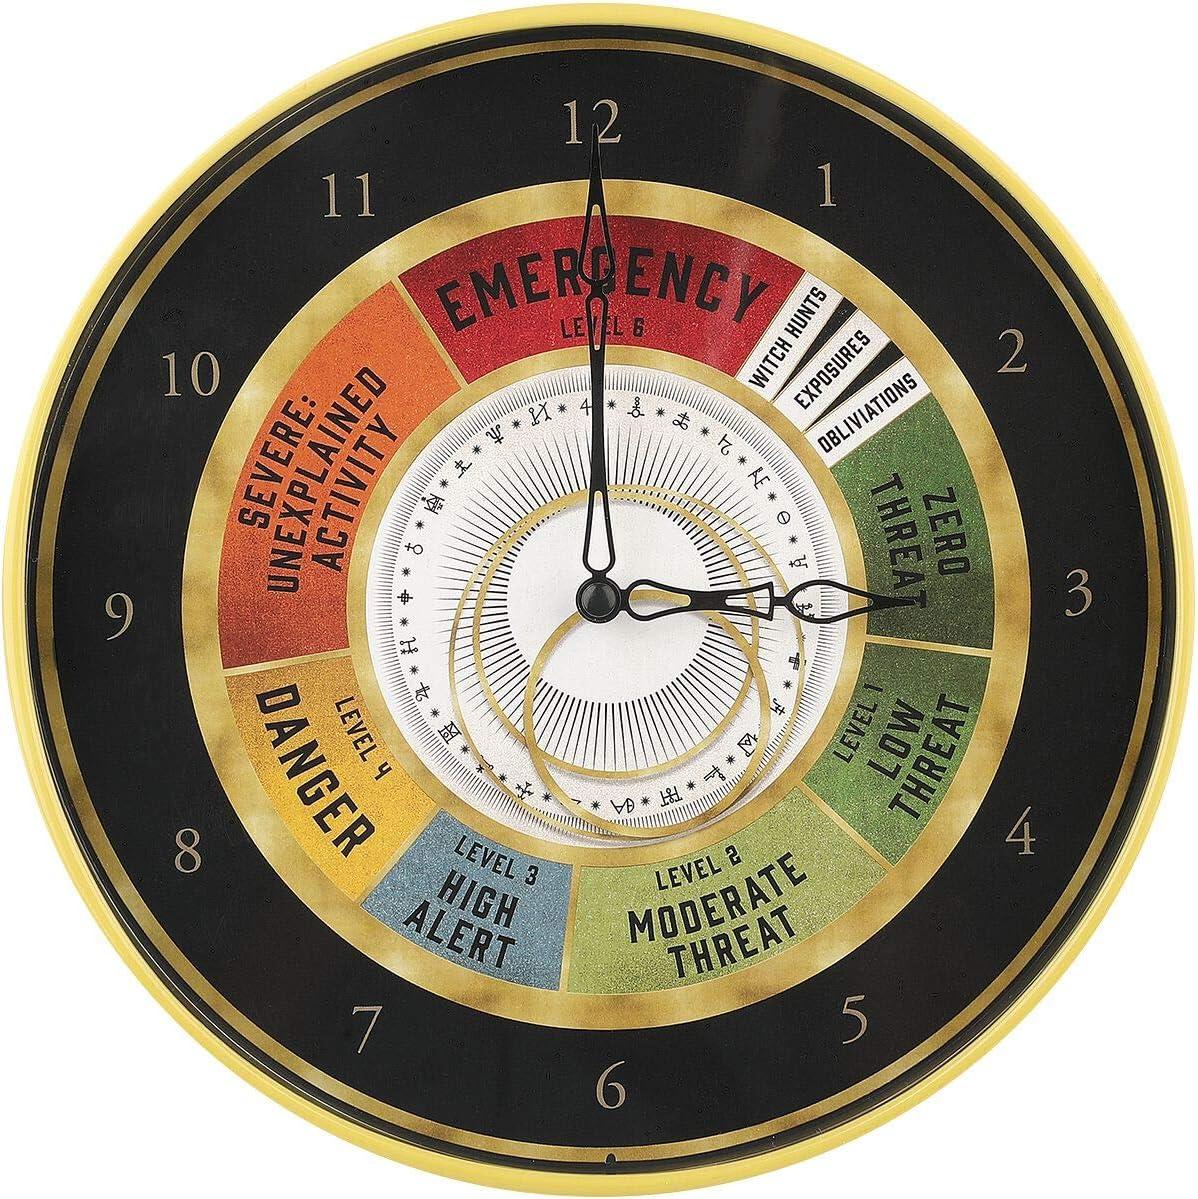 Animales Fantásticos Magical Exposure Threat Level Unisex Reloj de Pared Multicolor, Plastico,